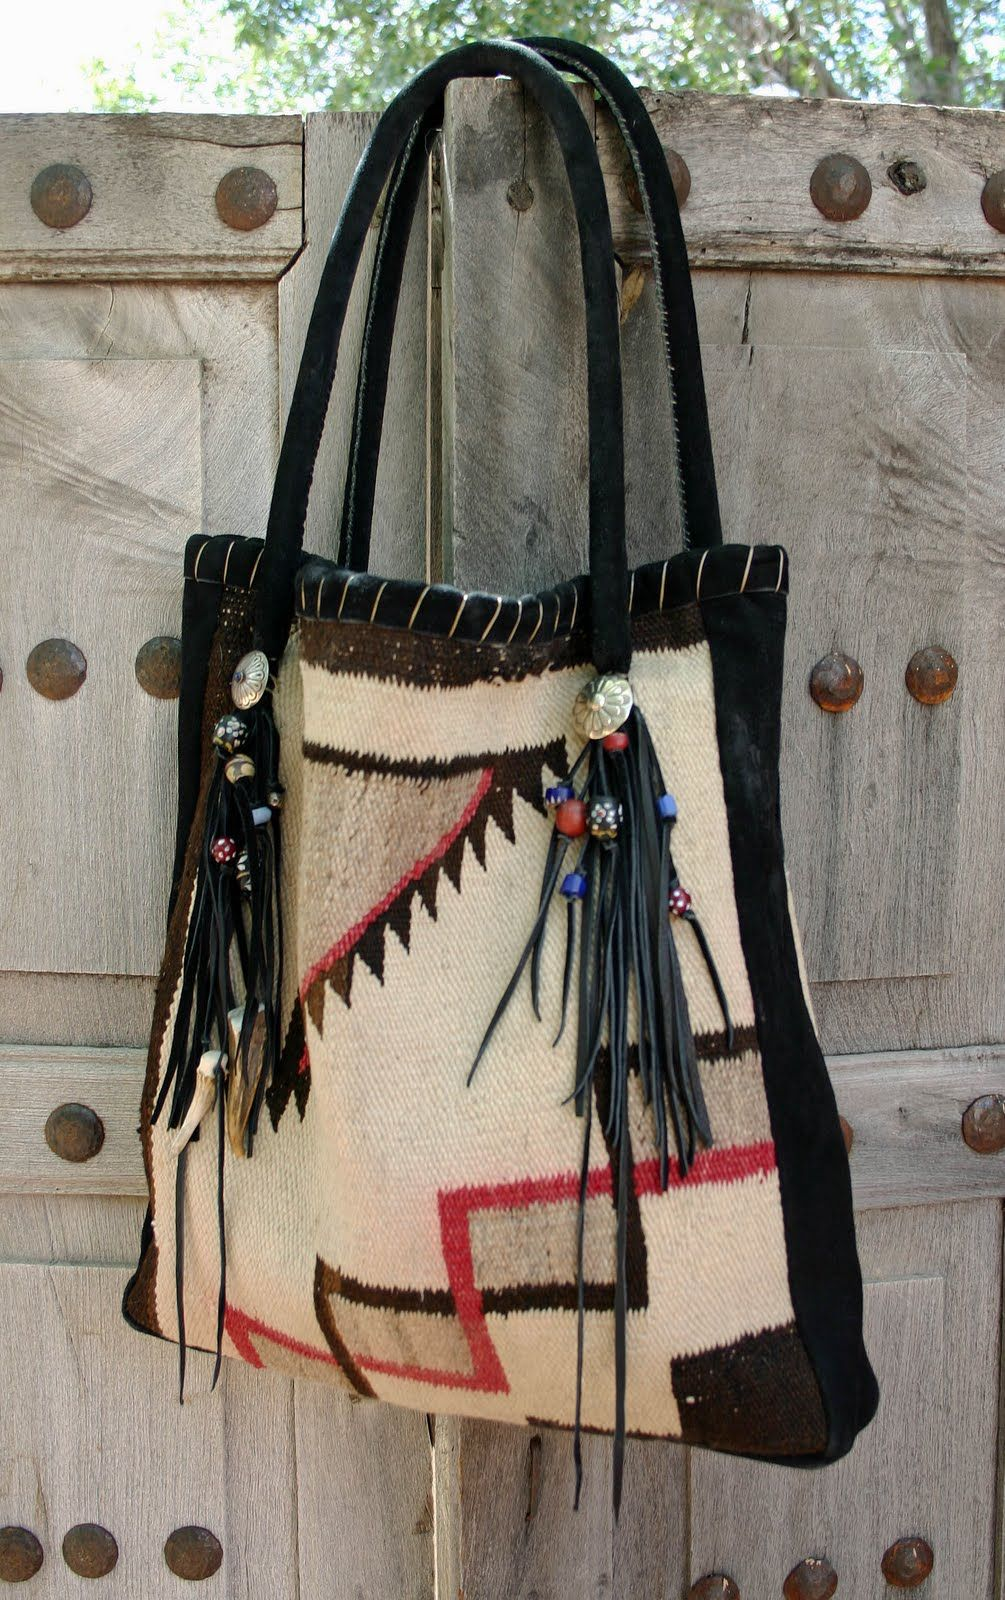 Navajo Blankets Rugs Vintage Or Gently Used Horse Tack